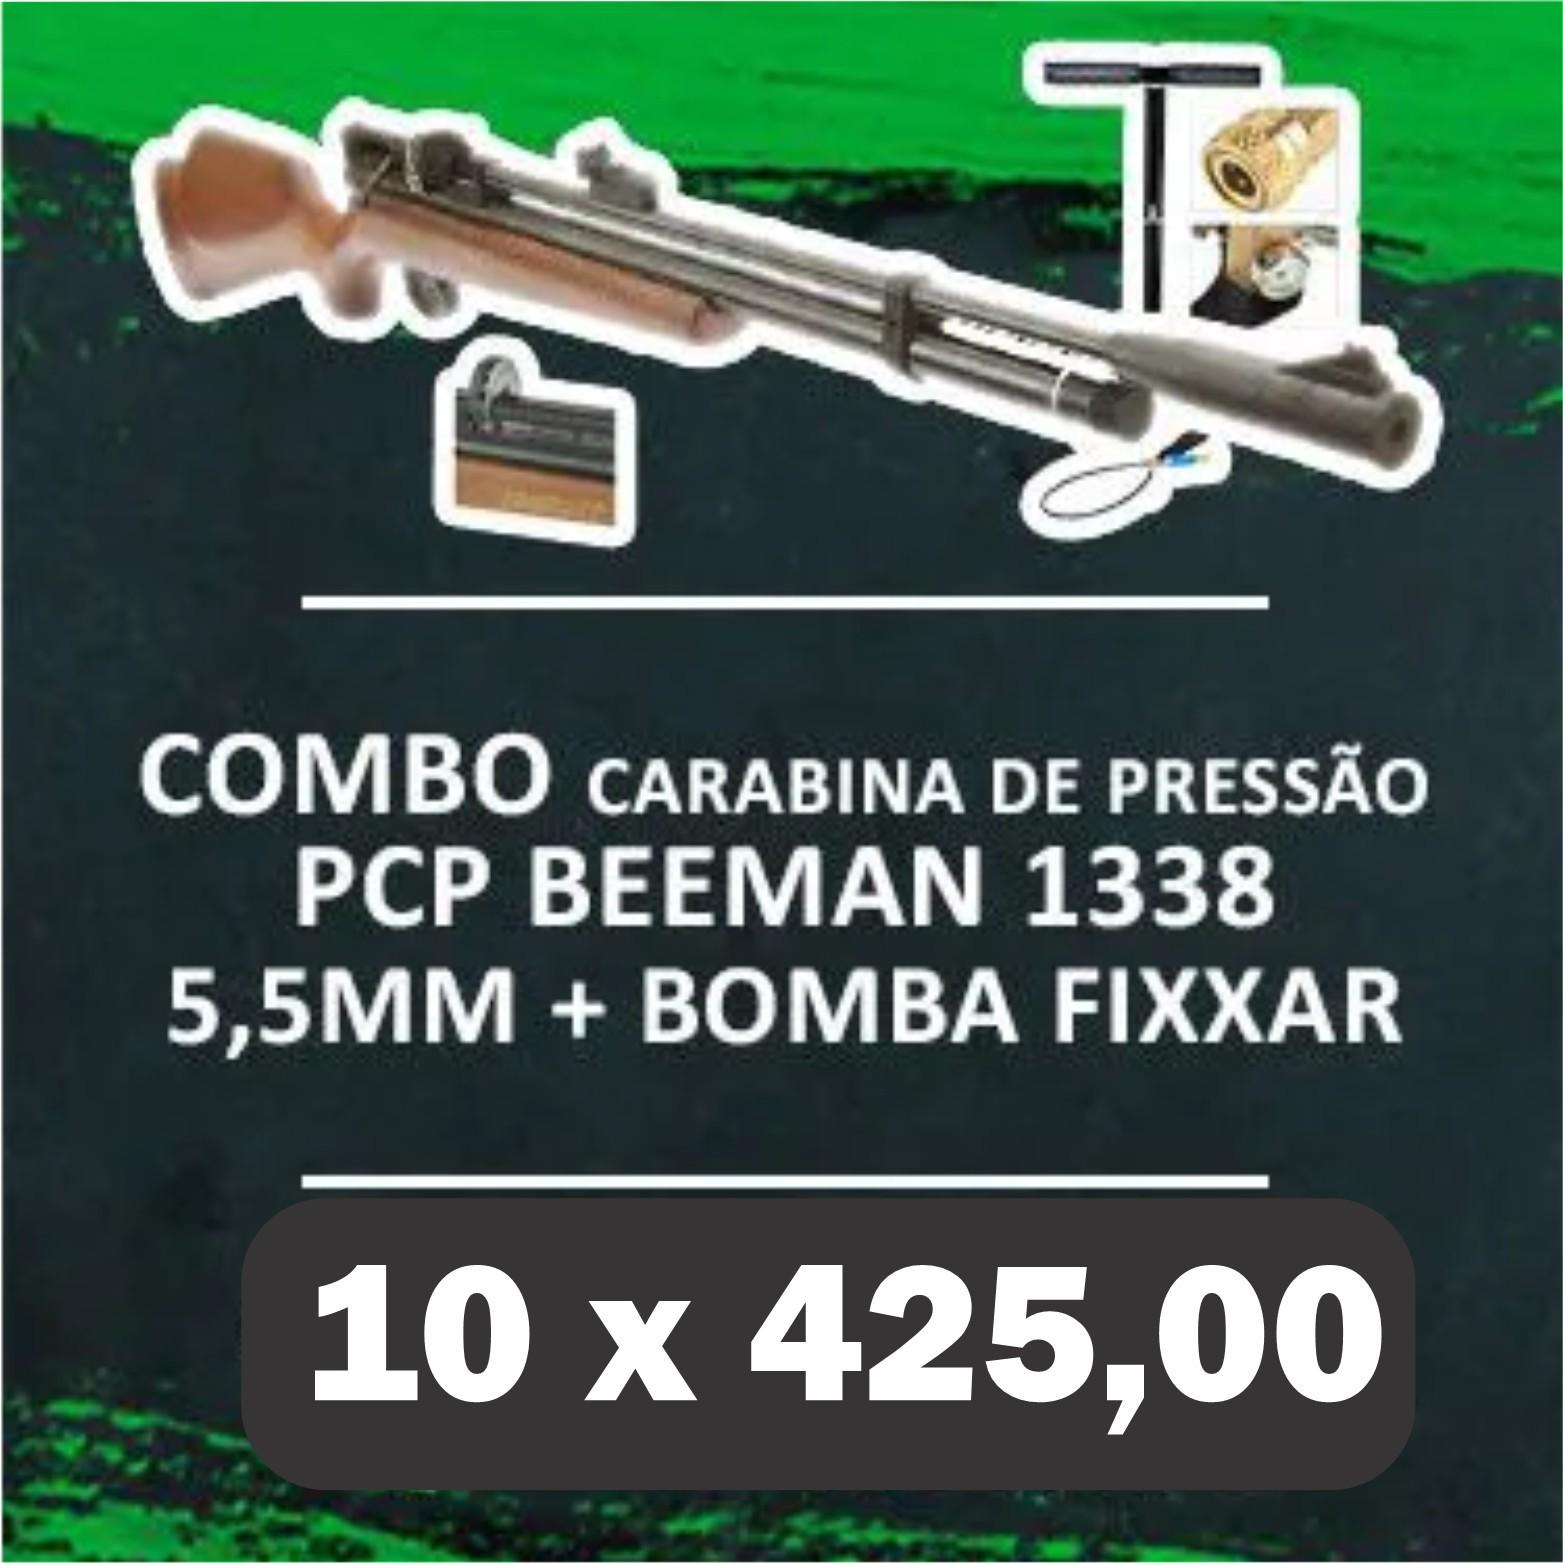 Consórcio - Carabina PCP Beeman 1338  QB II PLUS 10 tiros 5,5mm 1+ Bomba ROSSI